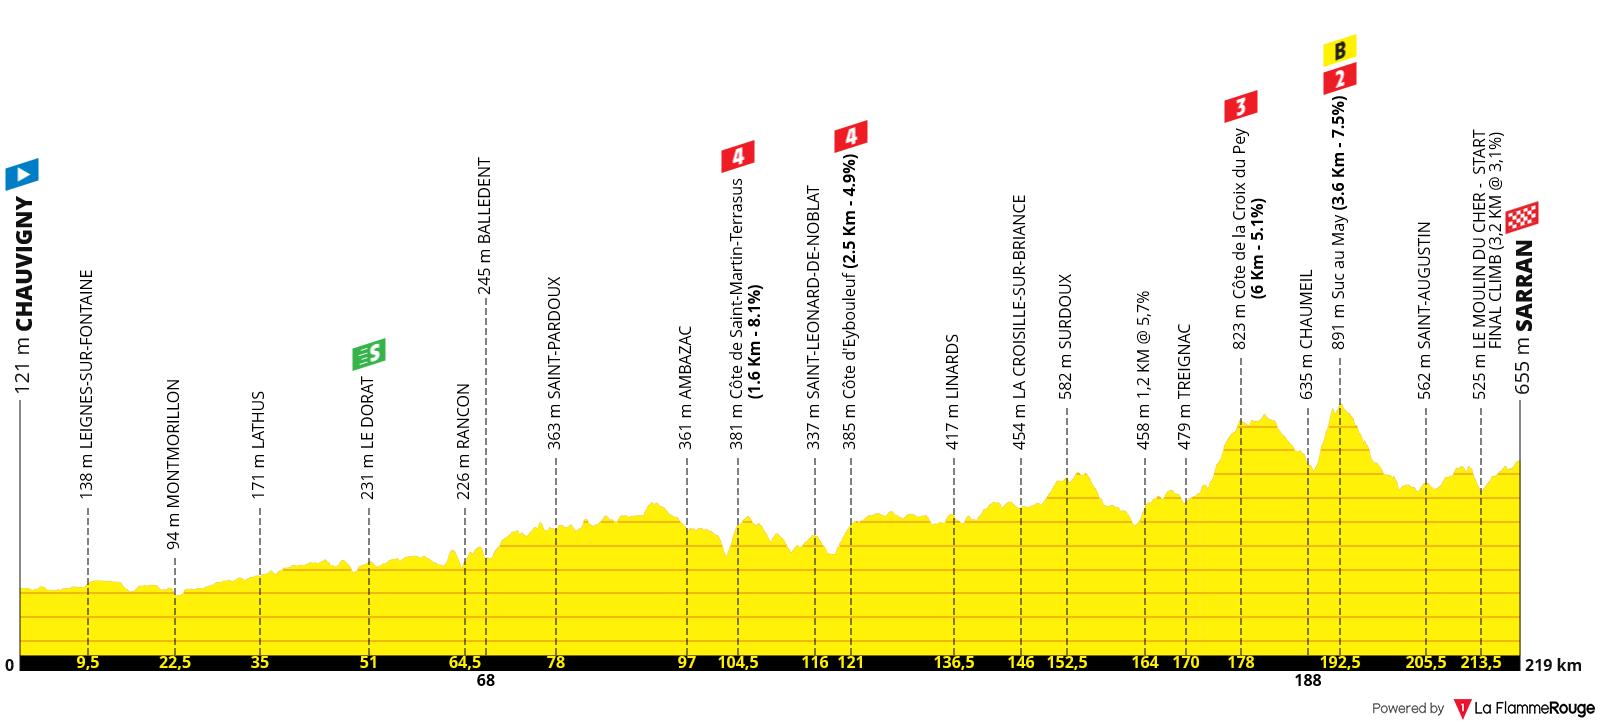 Perfil Etapa 12 - Tour de Francia 2020 - Chauvigny Sarran Corrèze 218km